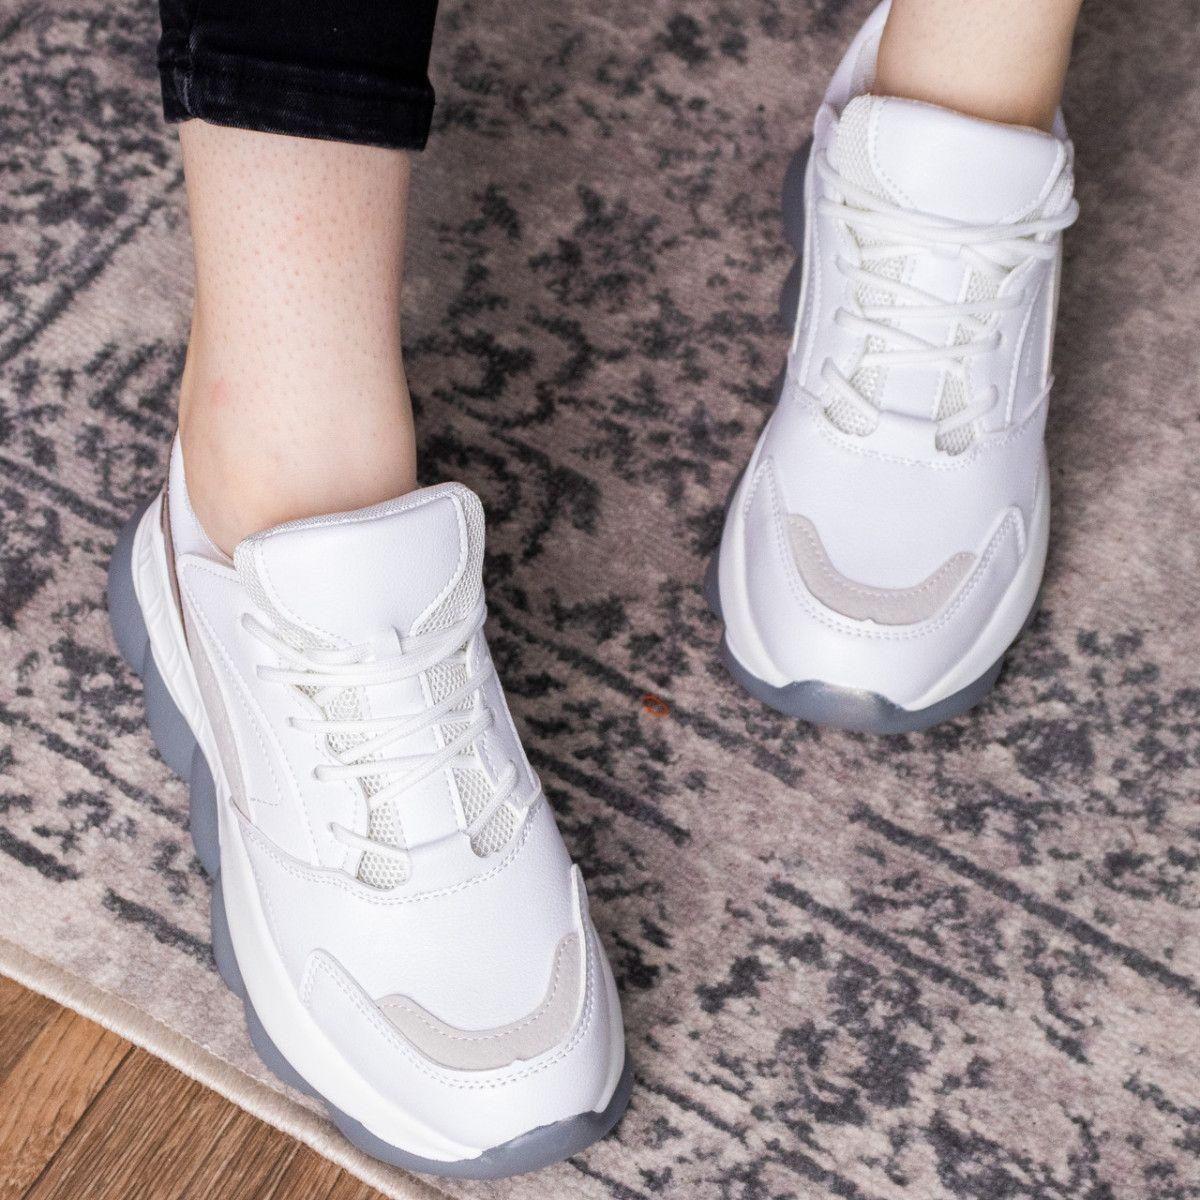 Женские кроссовки Fashion Bubbles 1642 39 размер 24 см Белые